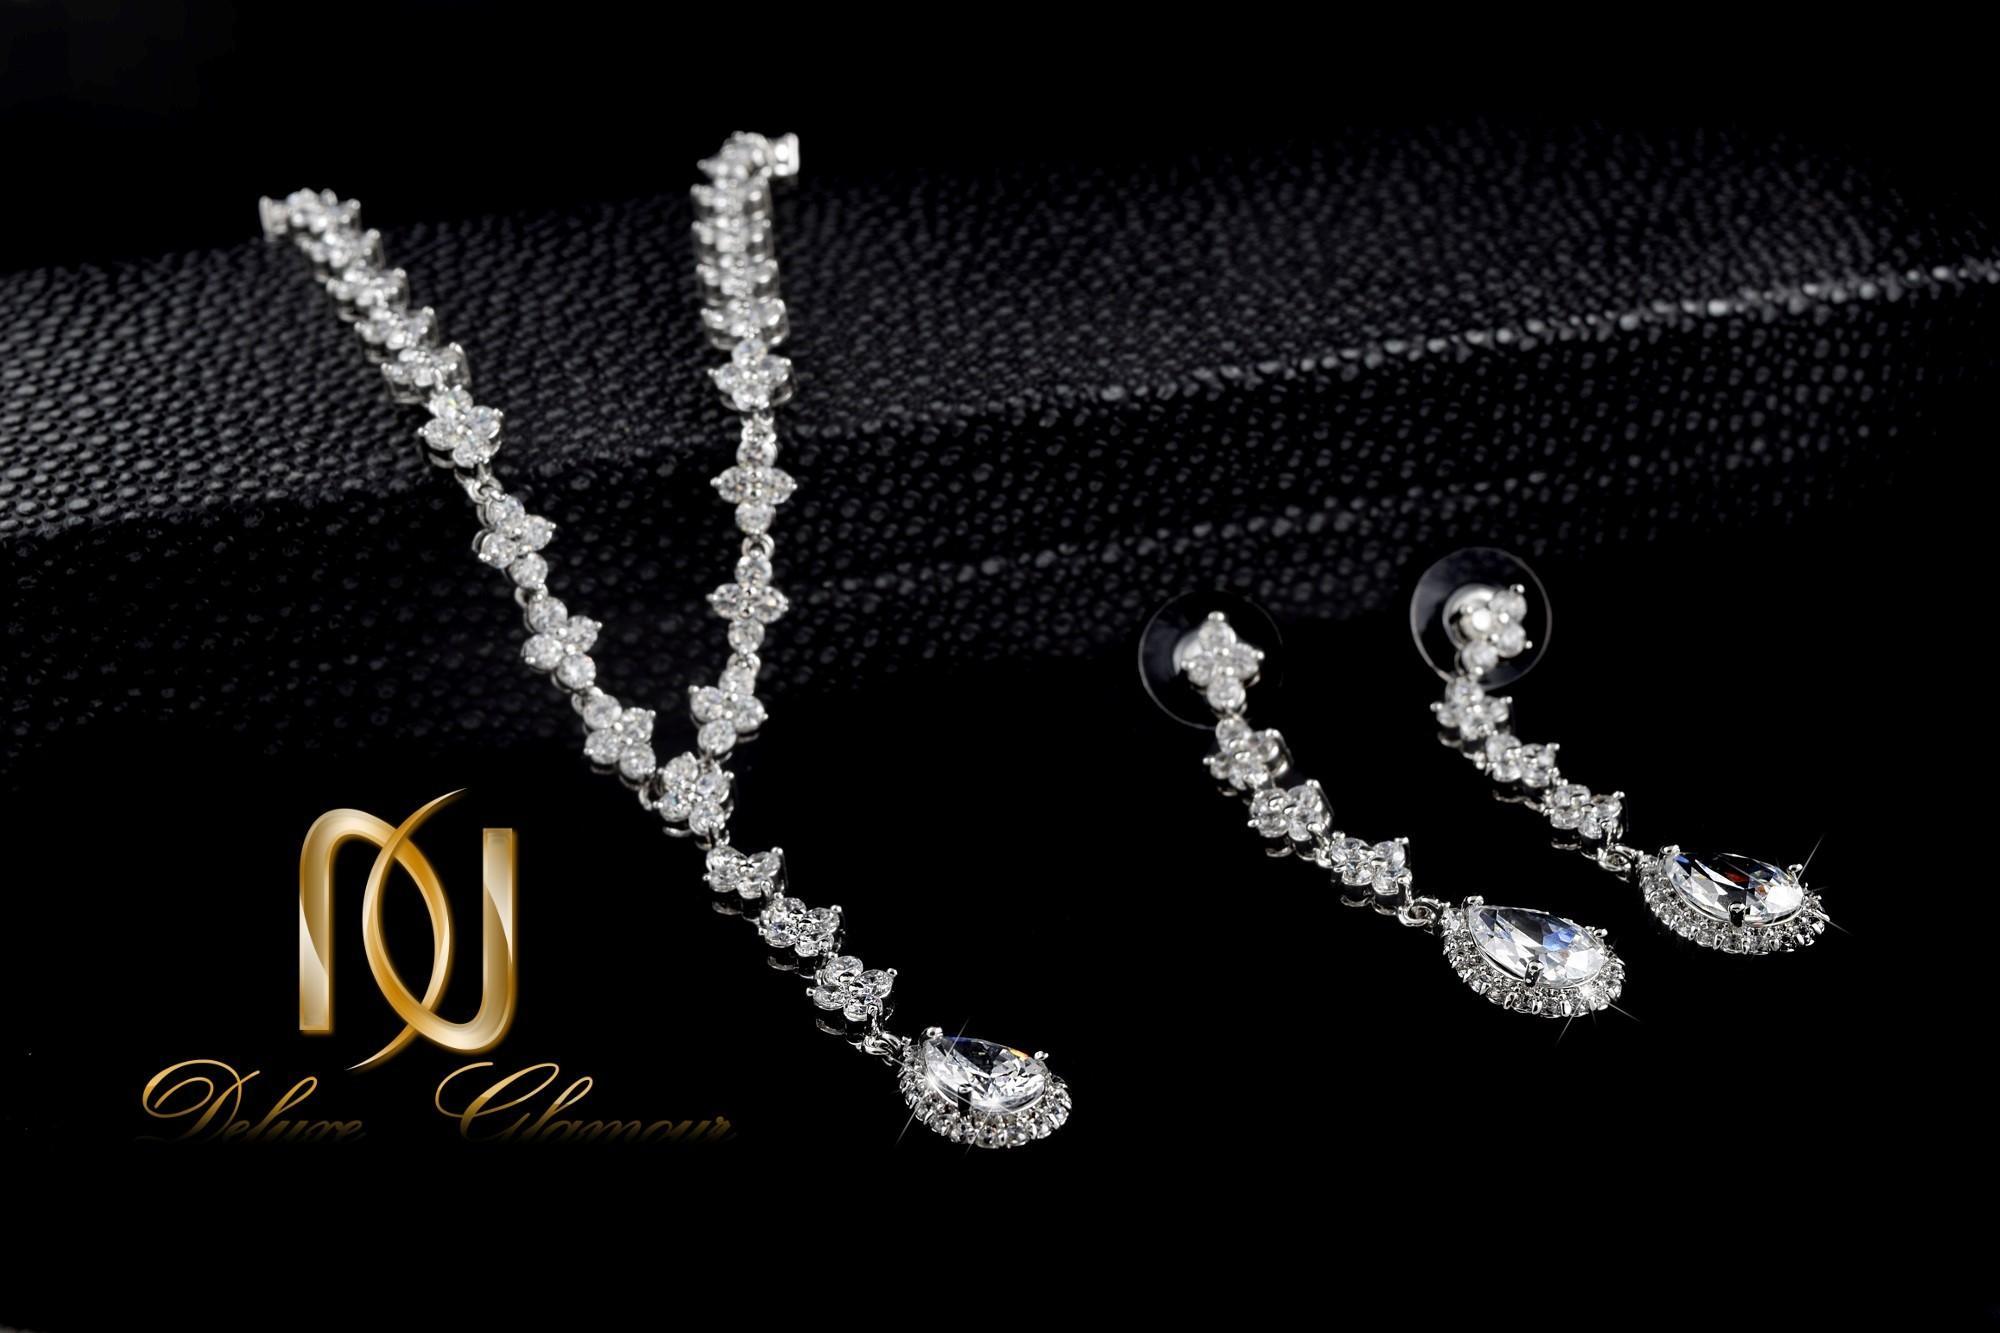 نیم ست جواهري عروس کلیو با کریستالهای سواروسکی Ns-n202 (1)